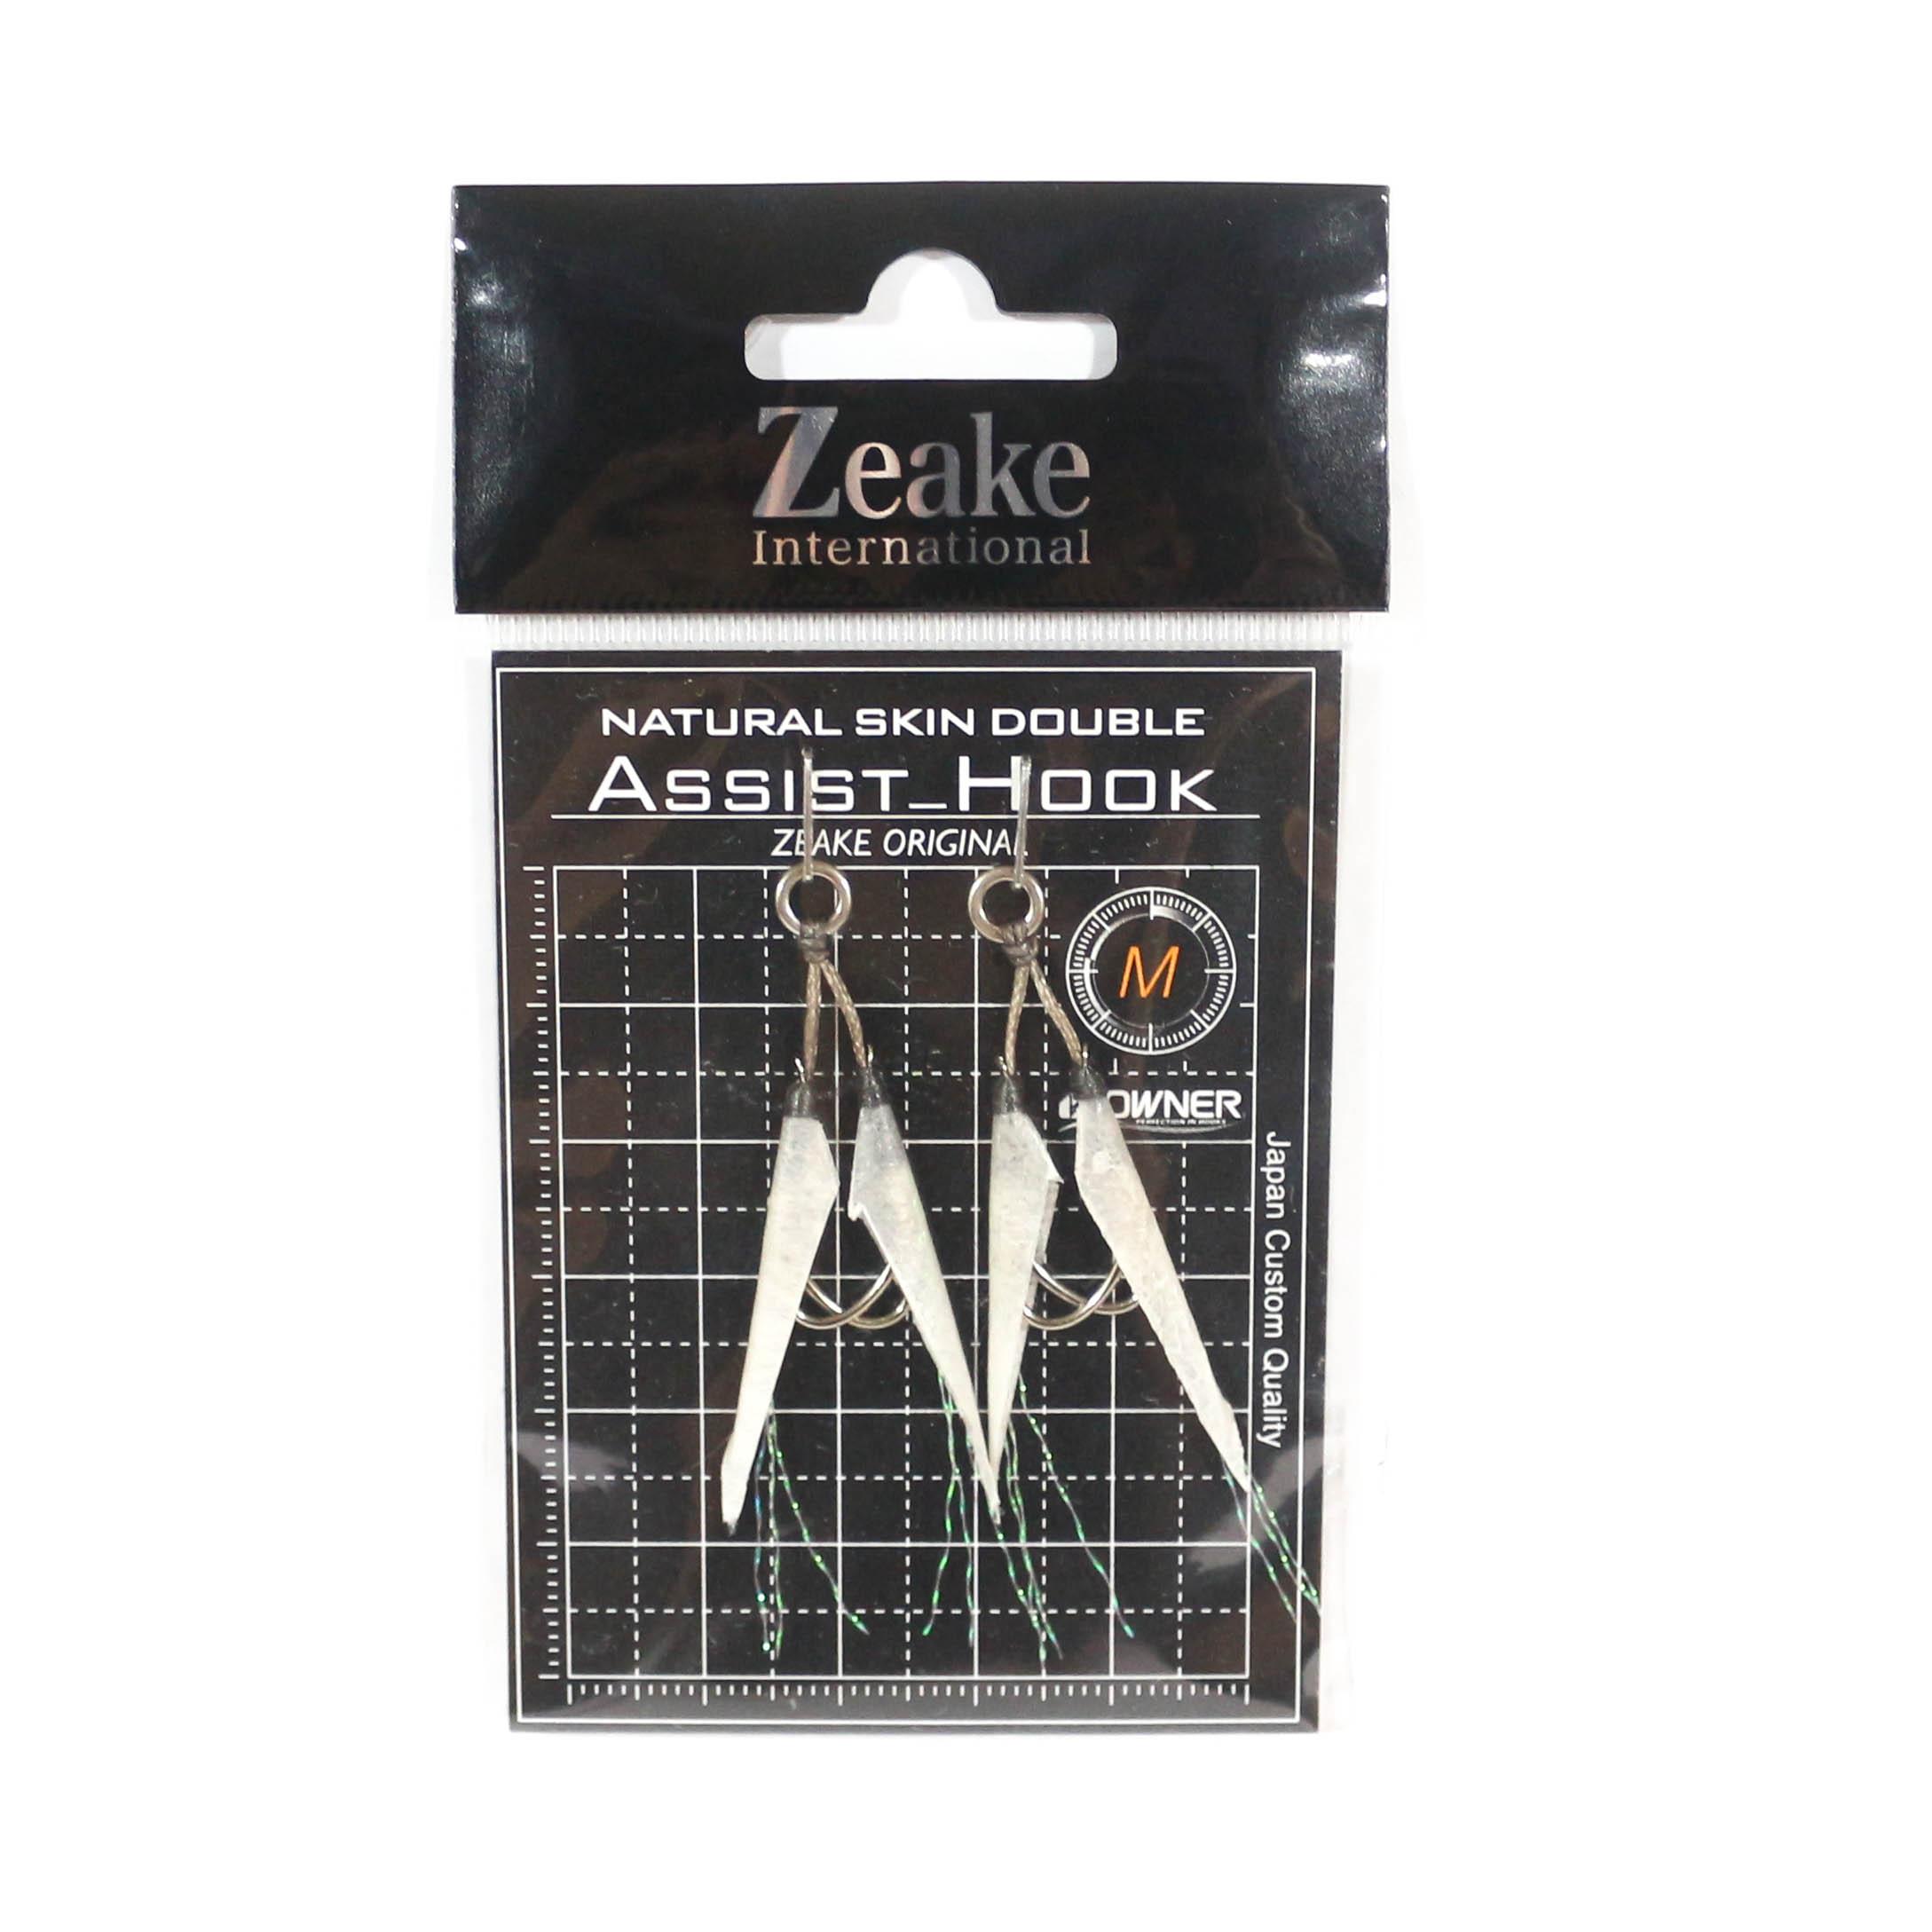 Zeake Assist Hook Double Fish Skin SLJ 2 per pack M (Size 4) (3063)